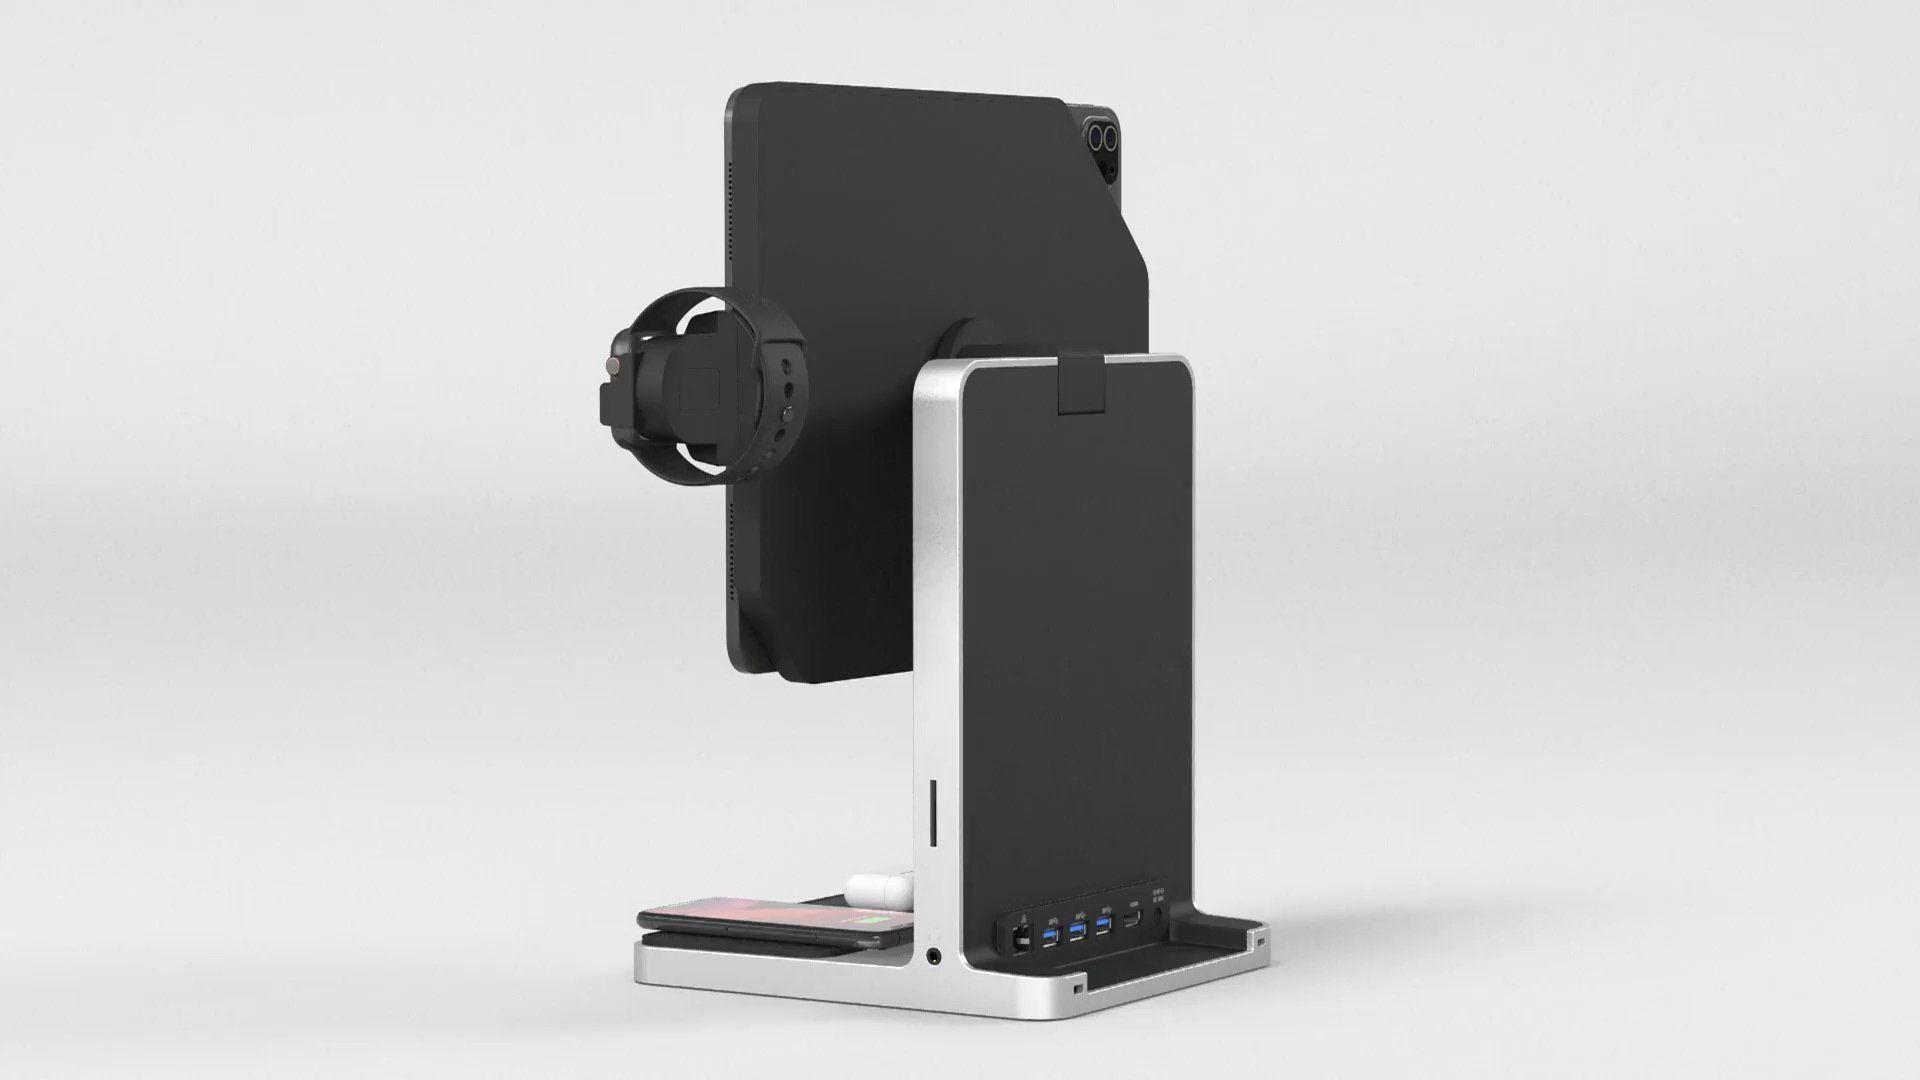 Studiodock Connect Charge Create Kensington In 2021 Apple Watch Charger Apple Charger Watch Charger